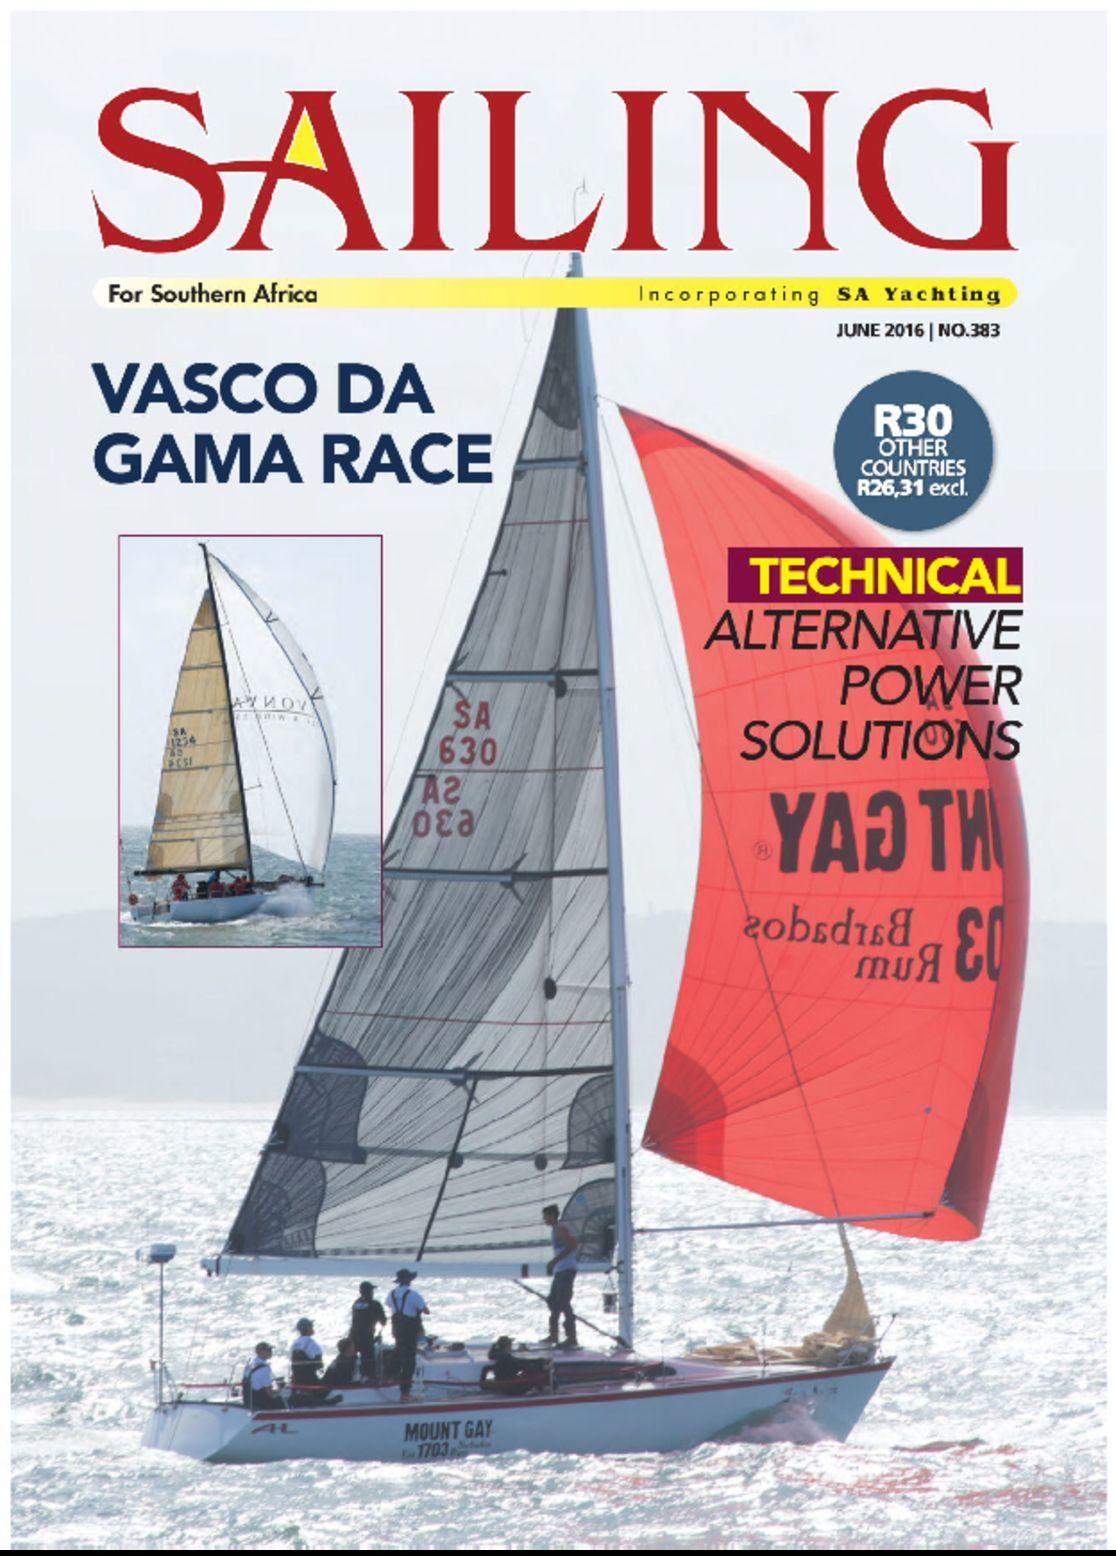 Sailing incorporating sa yachting digital magazine for Sa fishing promo code free shipping